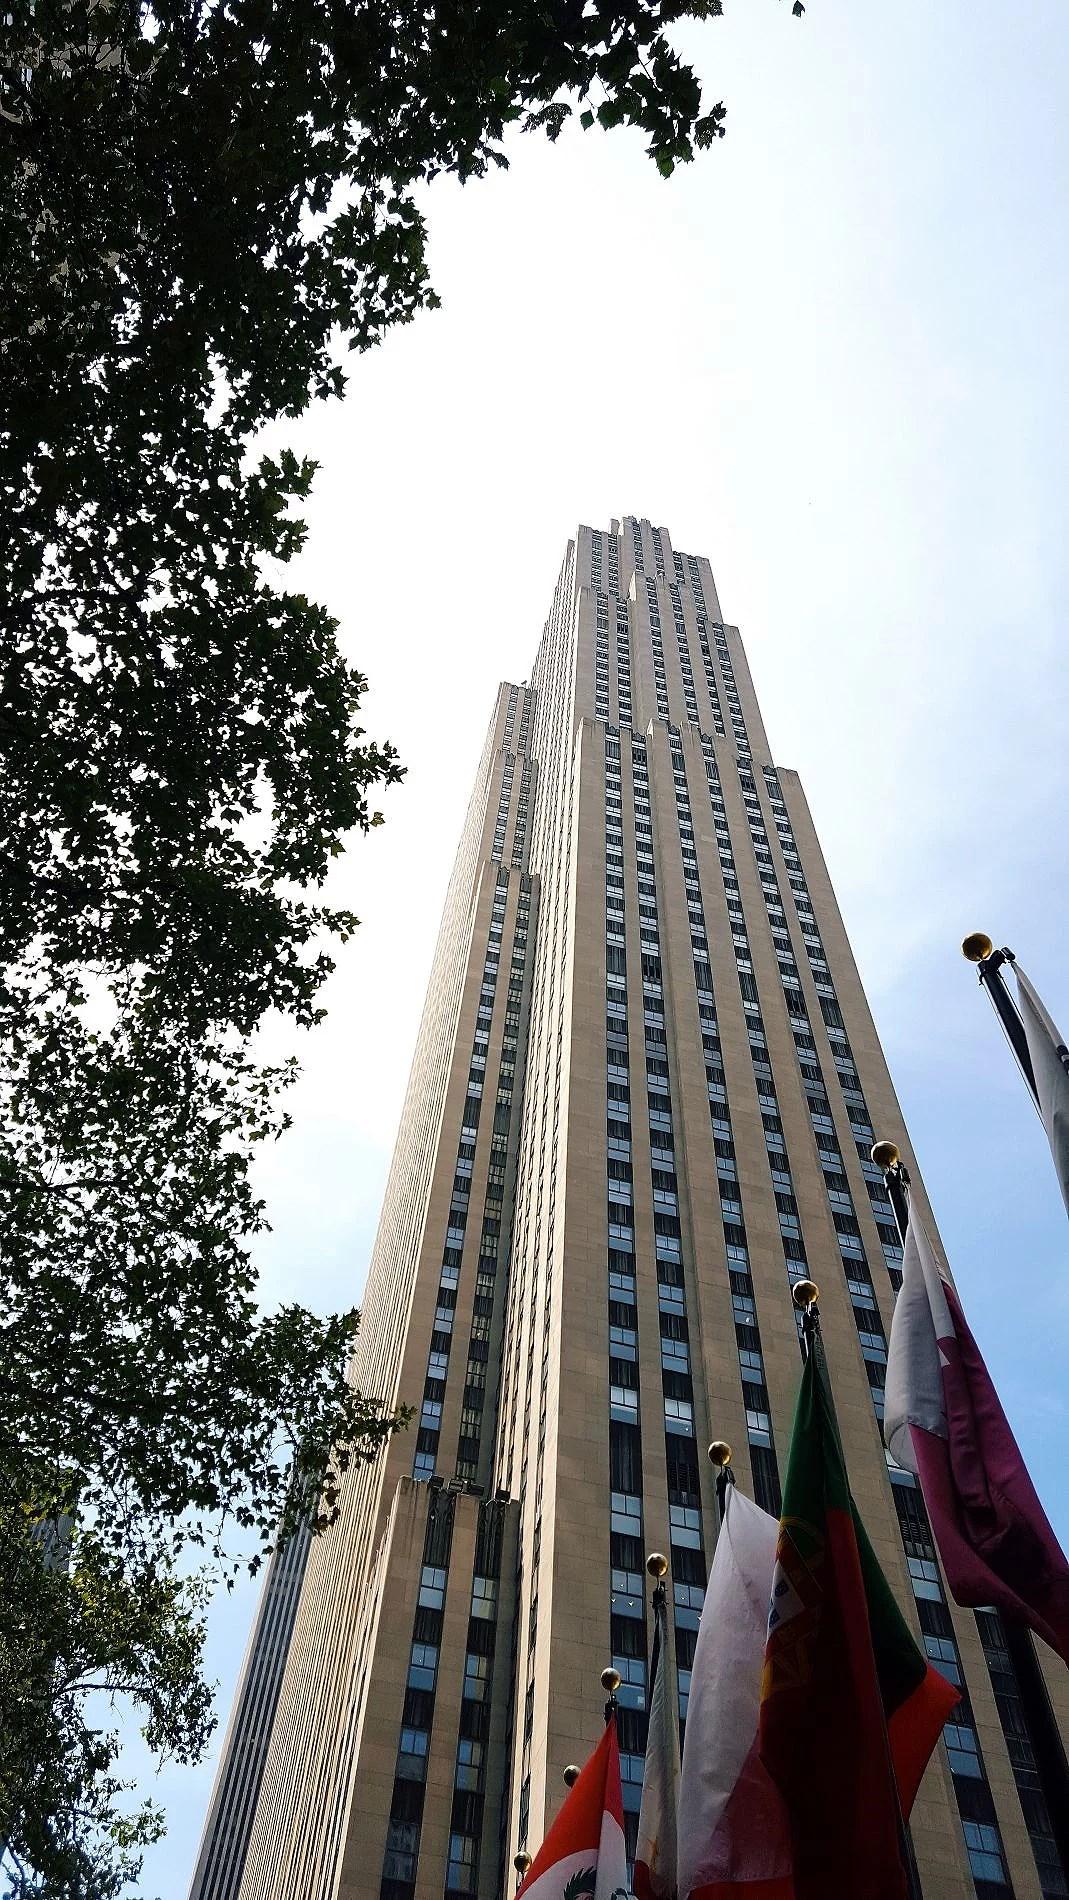 Upper and Lower Manhattan